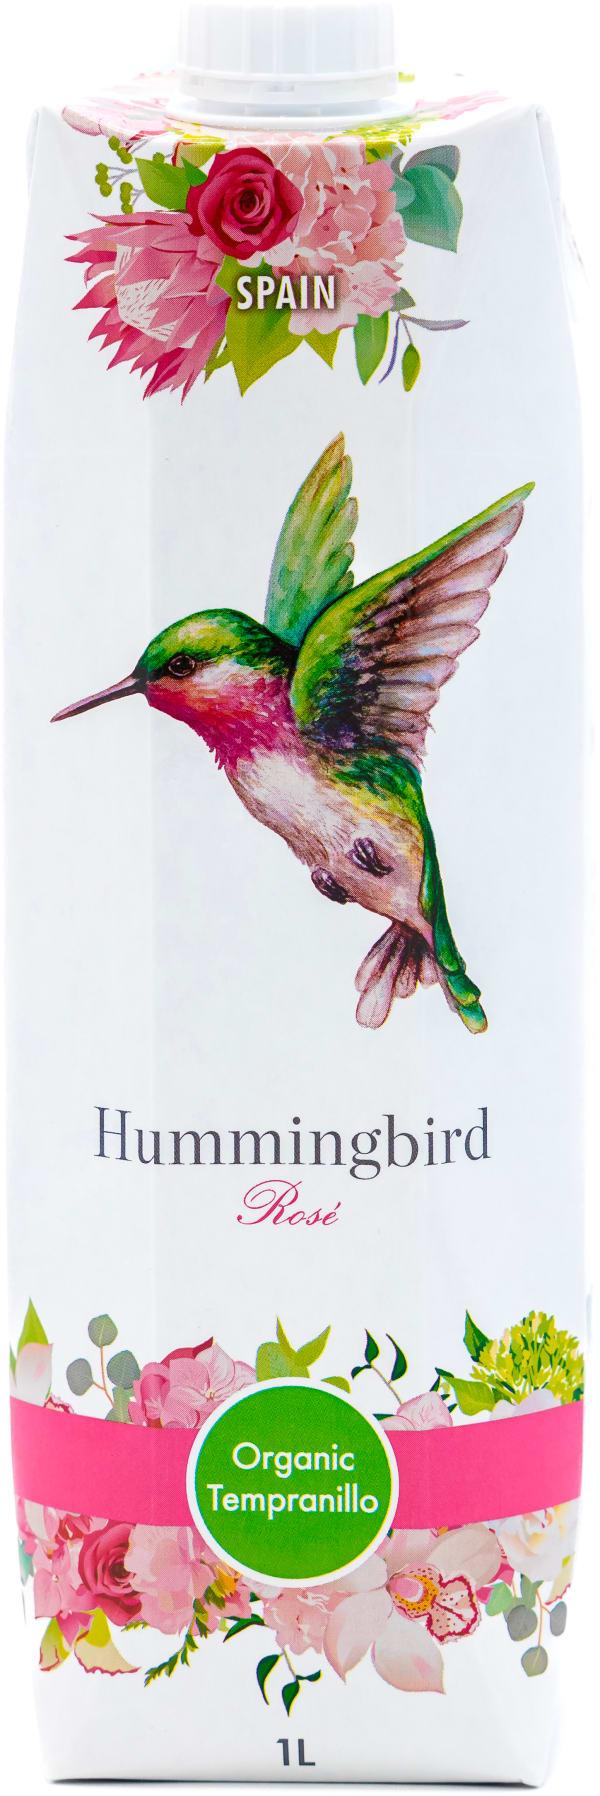 Hummingbird Organic Tempranillo Rosé 2019 carton package